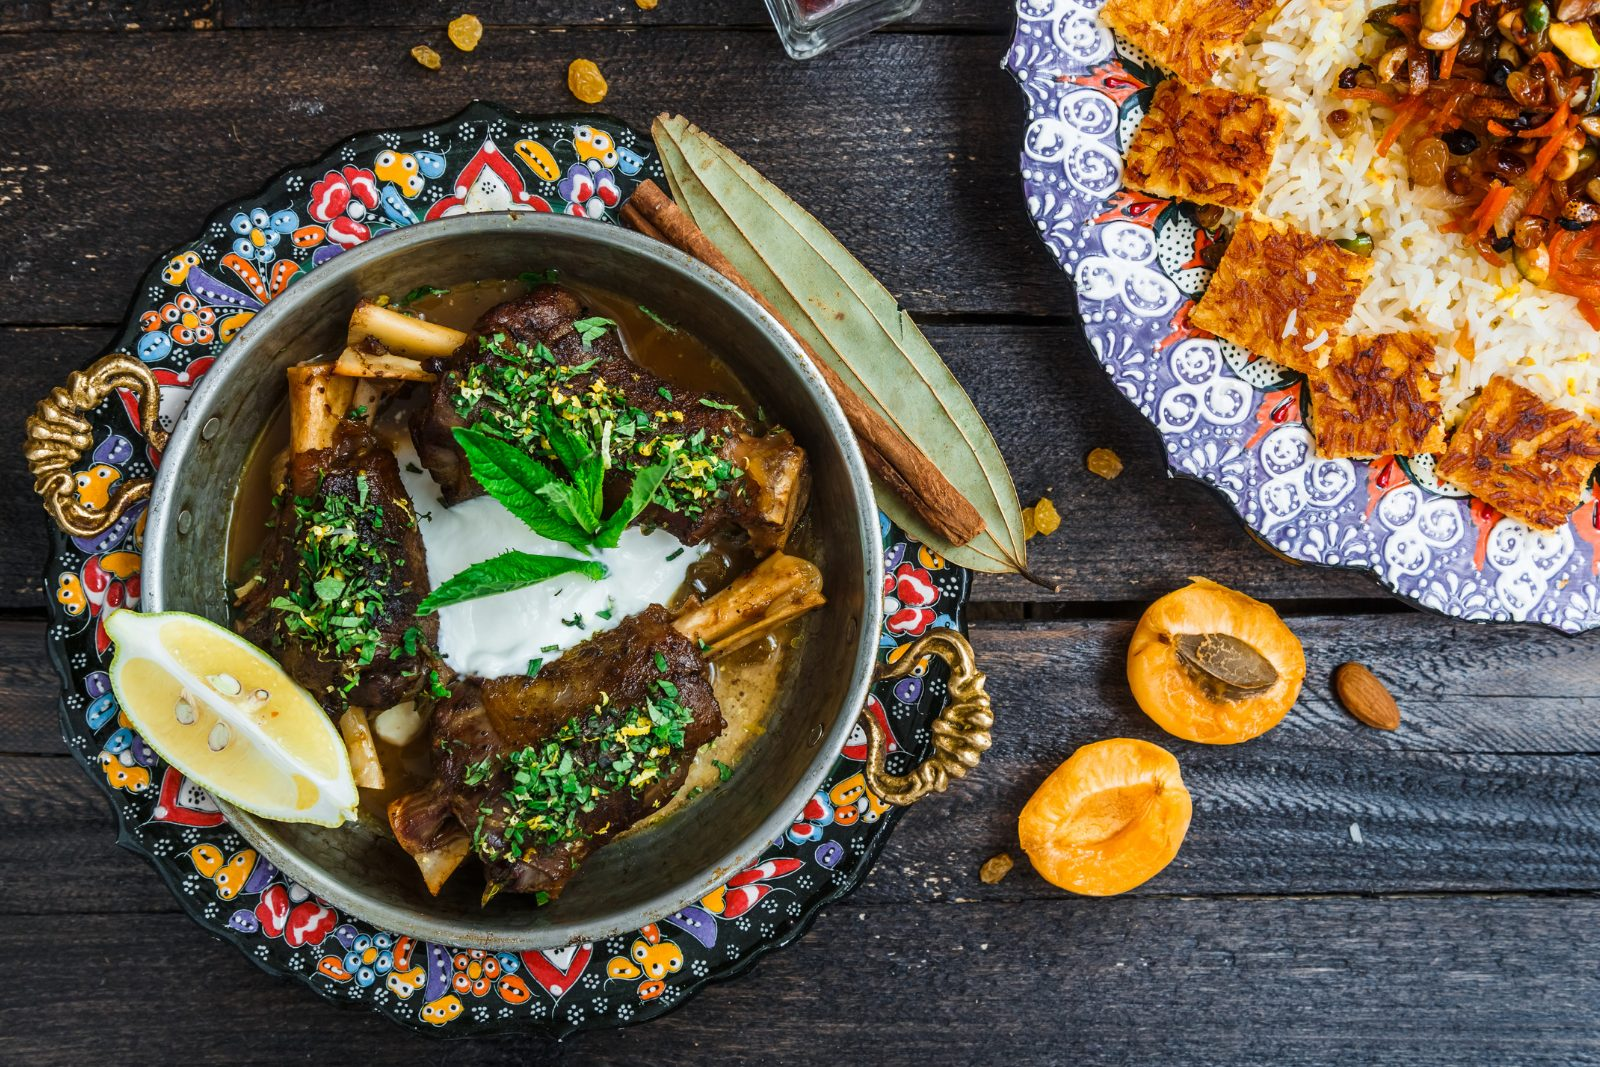 Persian Food and Recipes